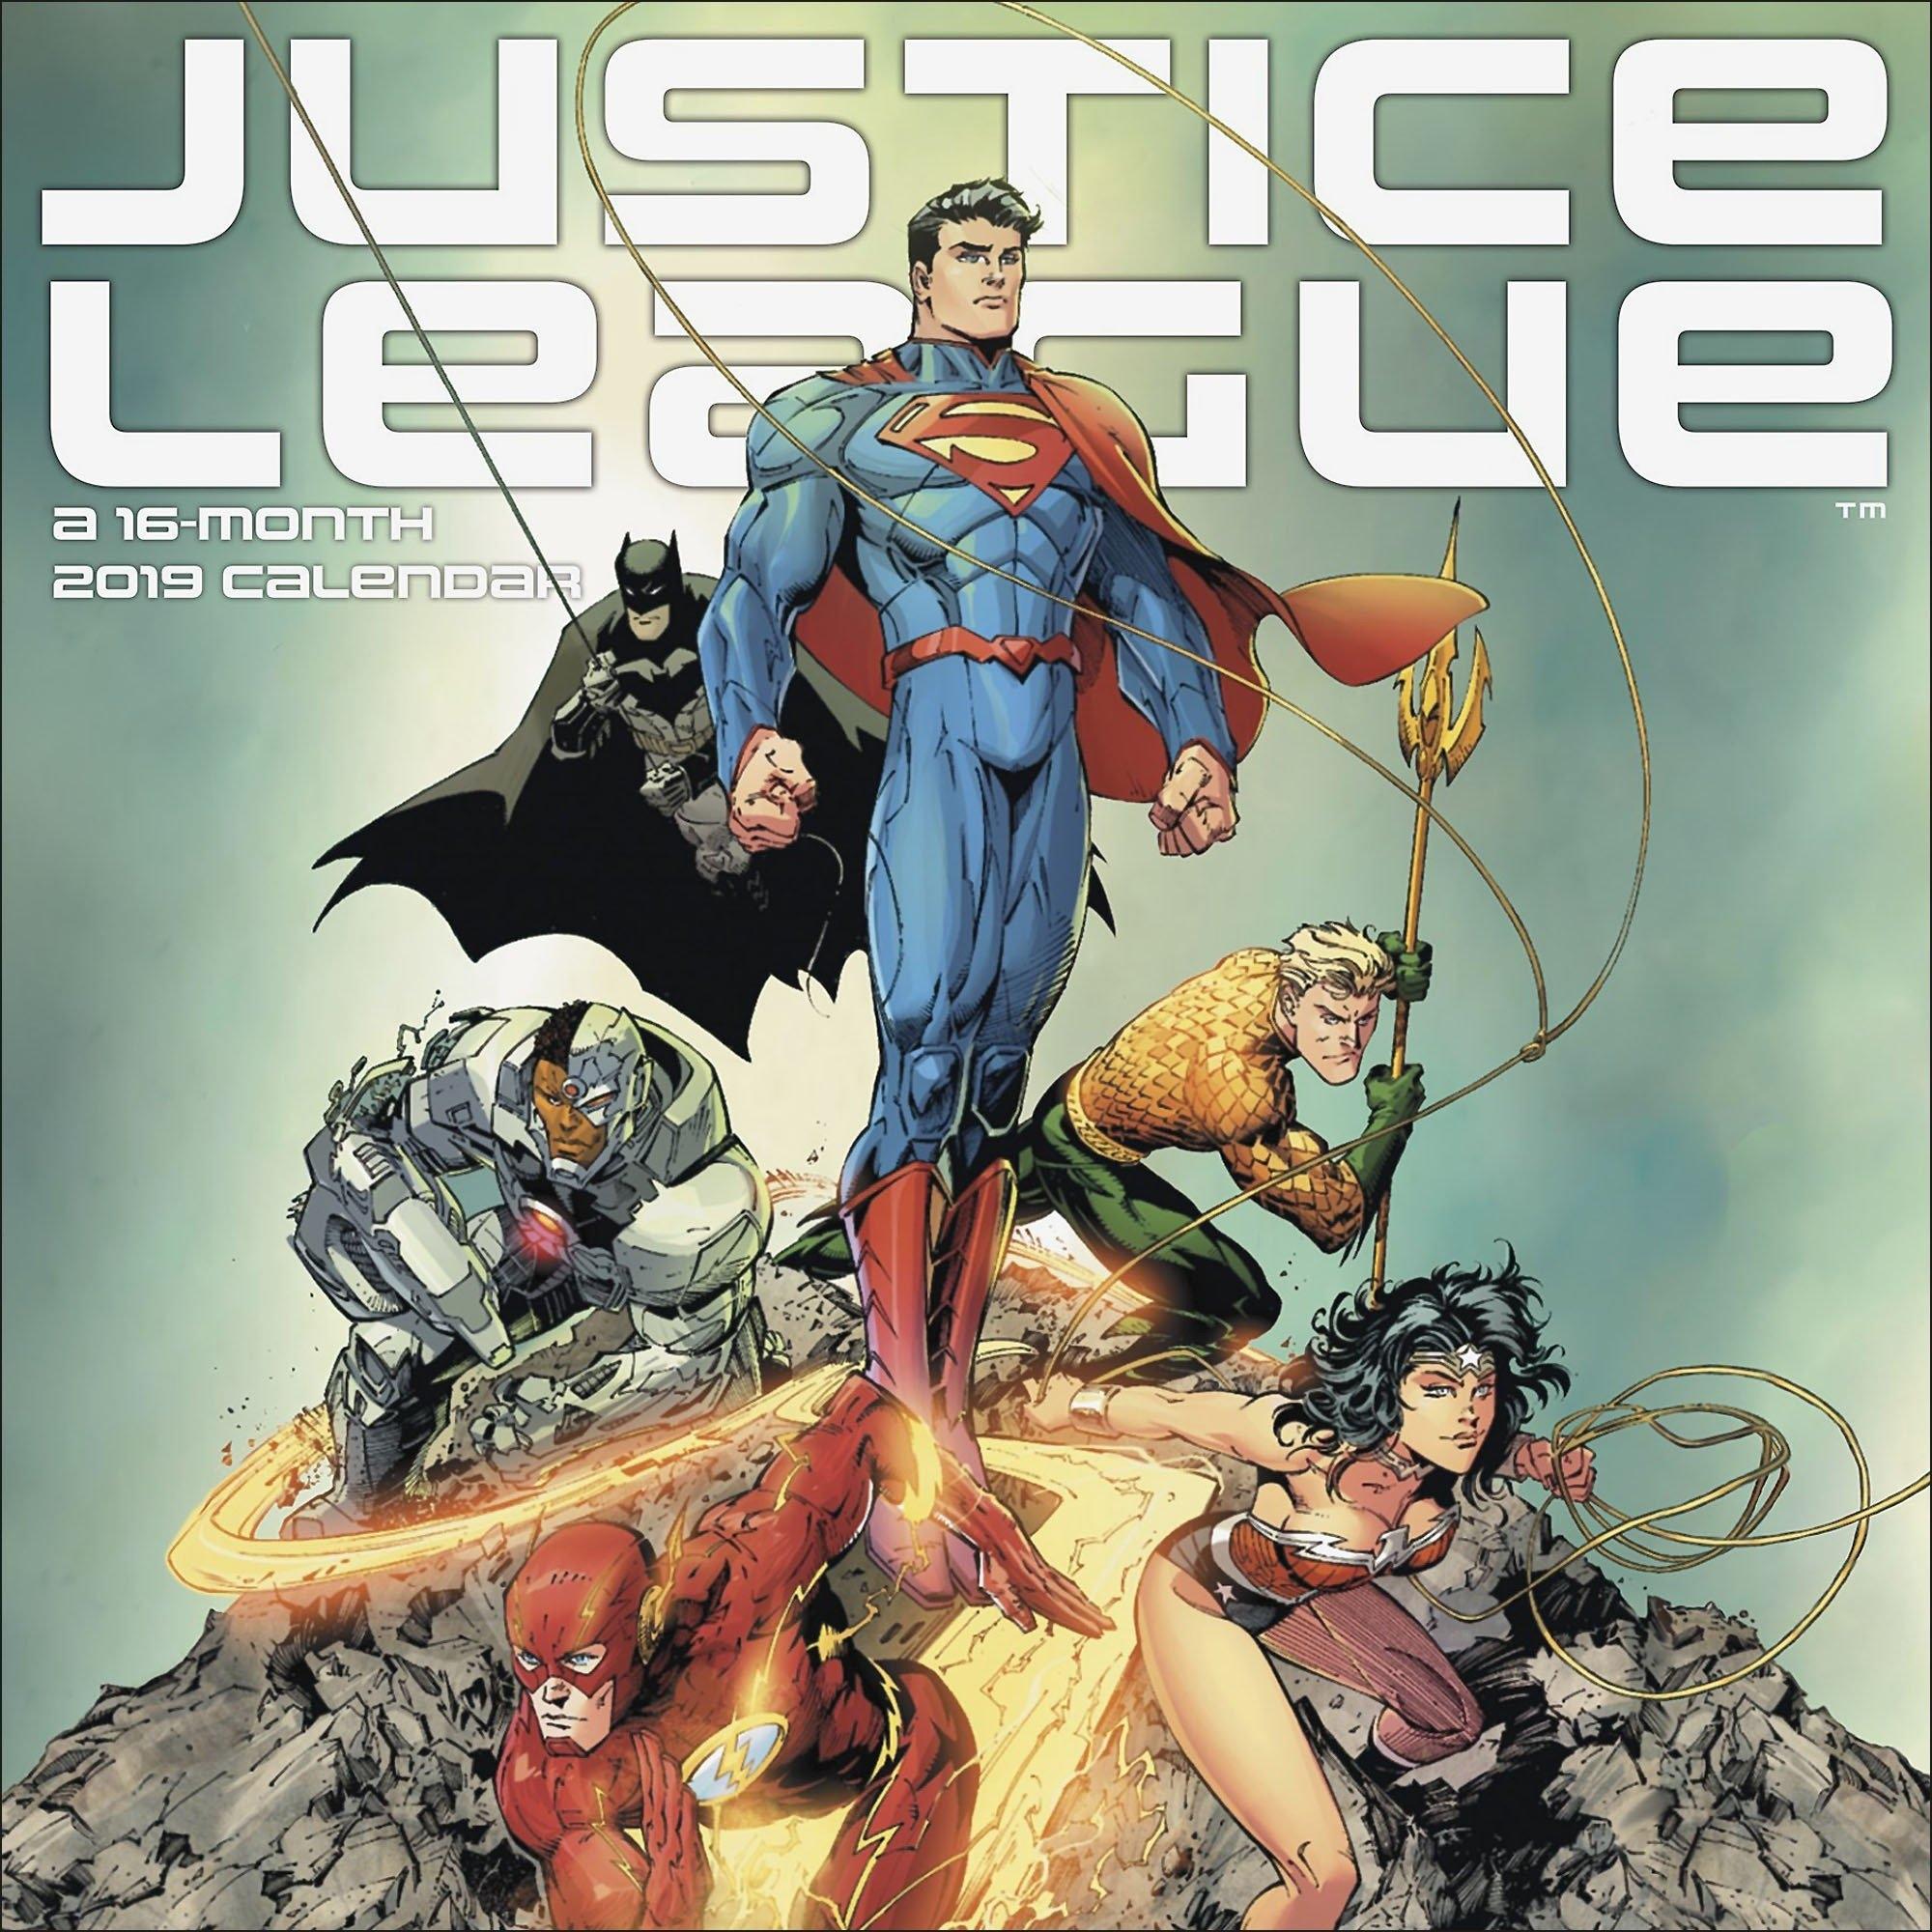 Justice League 2019 Calendar J Scott Campbell Calendar 2019